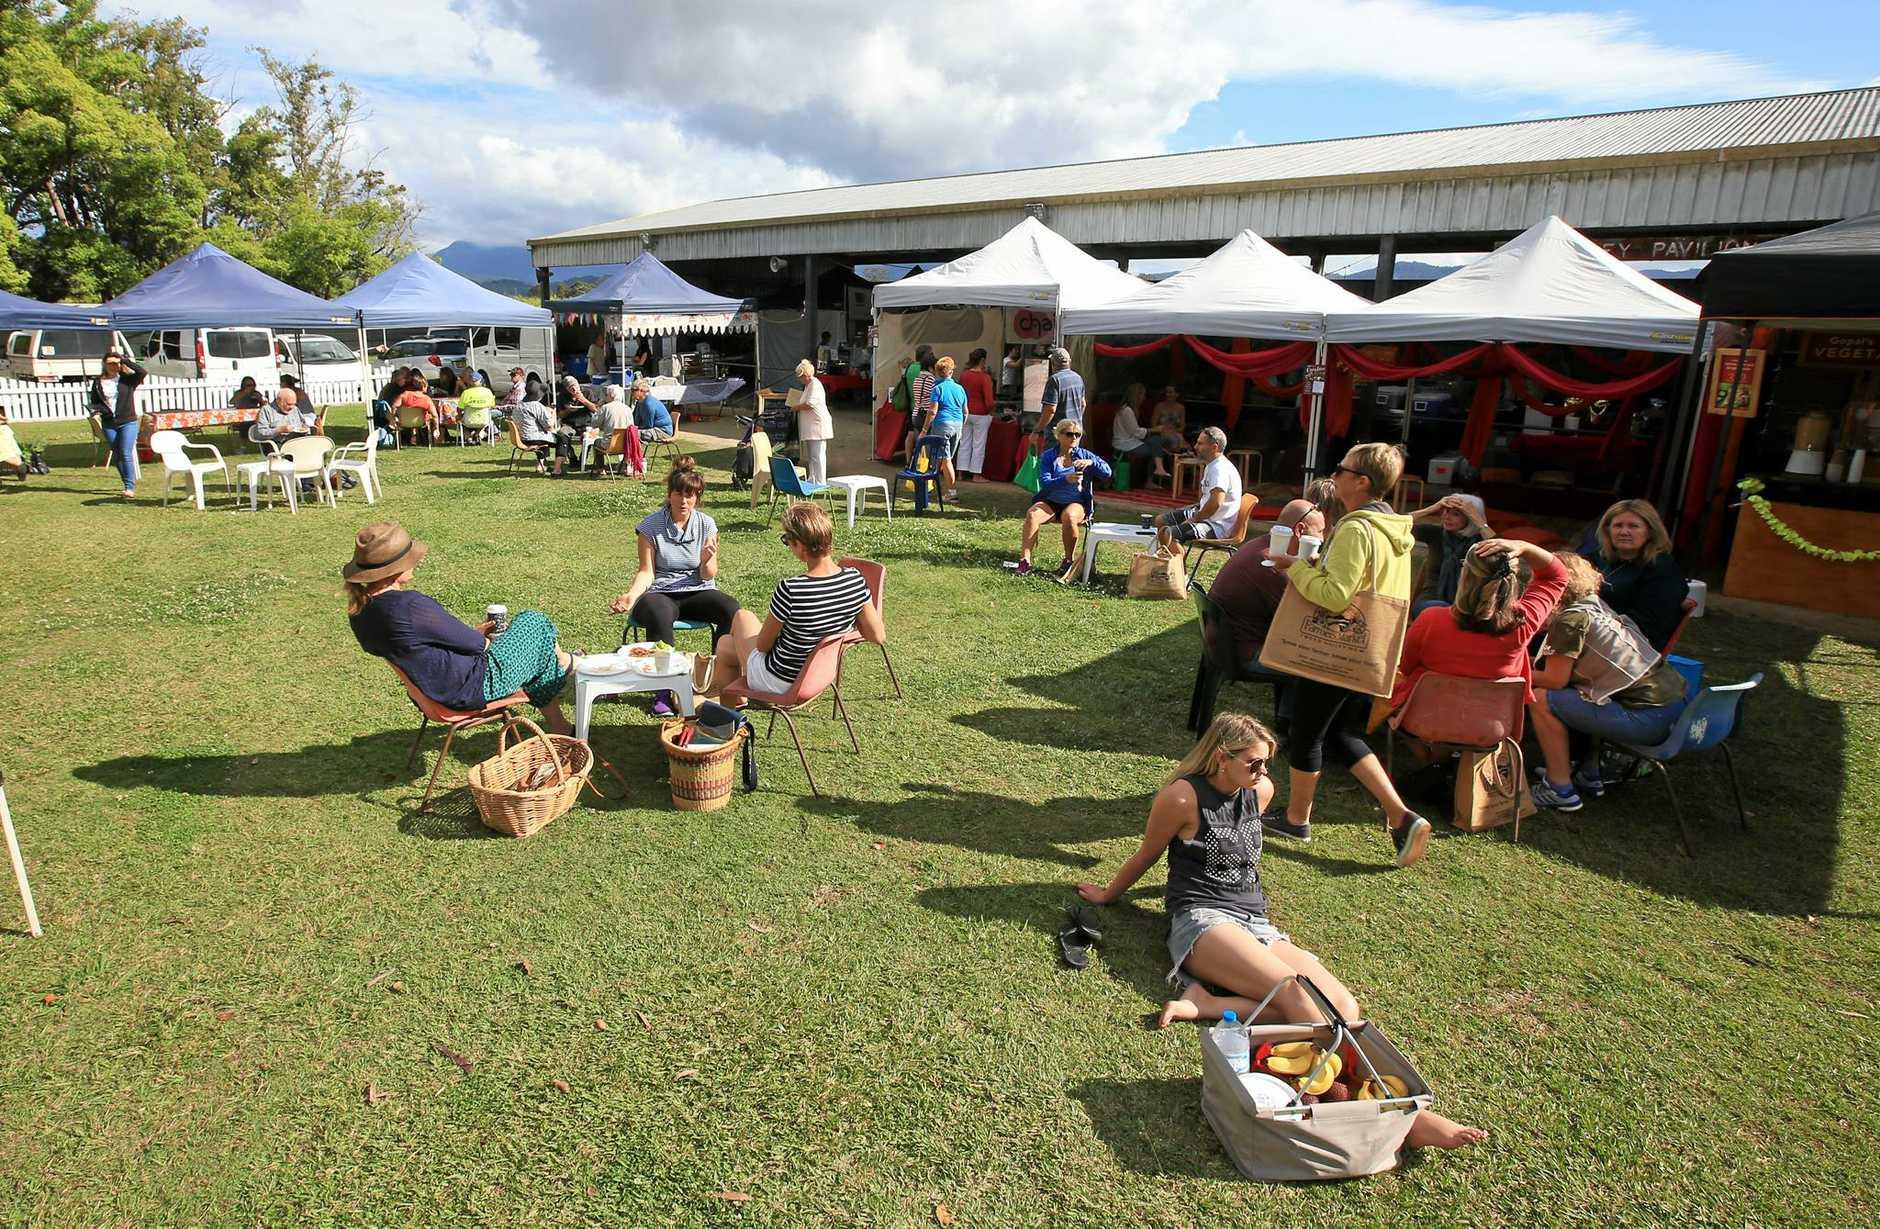 SOCIALS - Enjoying the Murwillumbah Farmers Markets